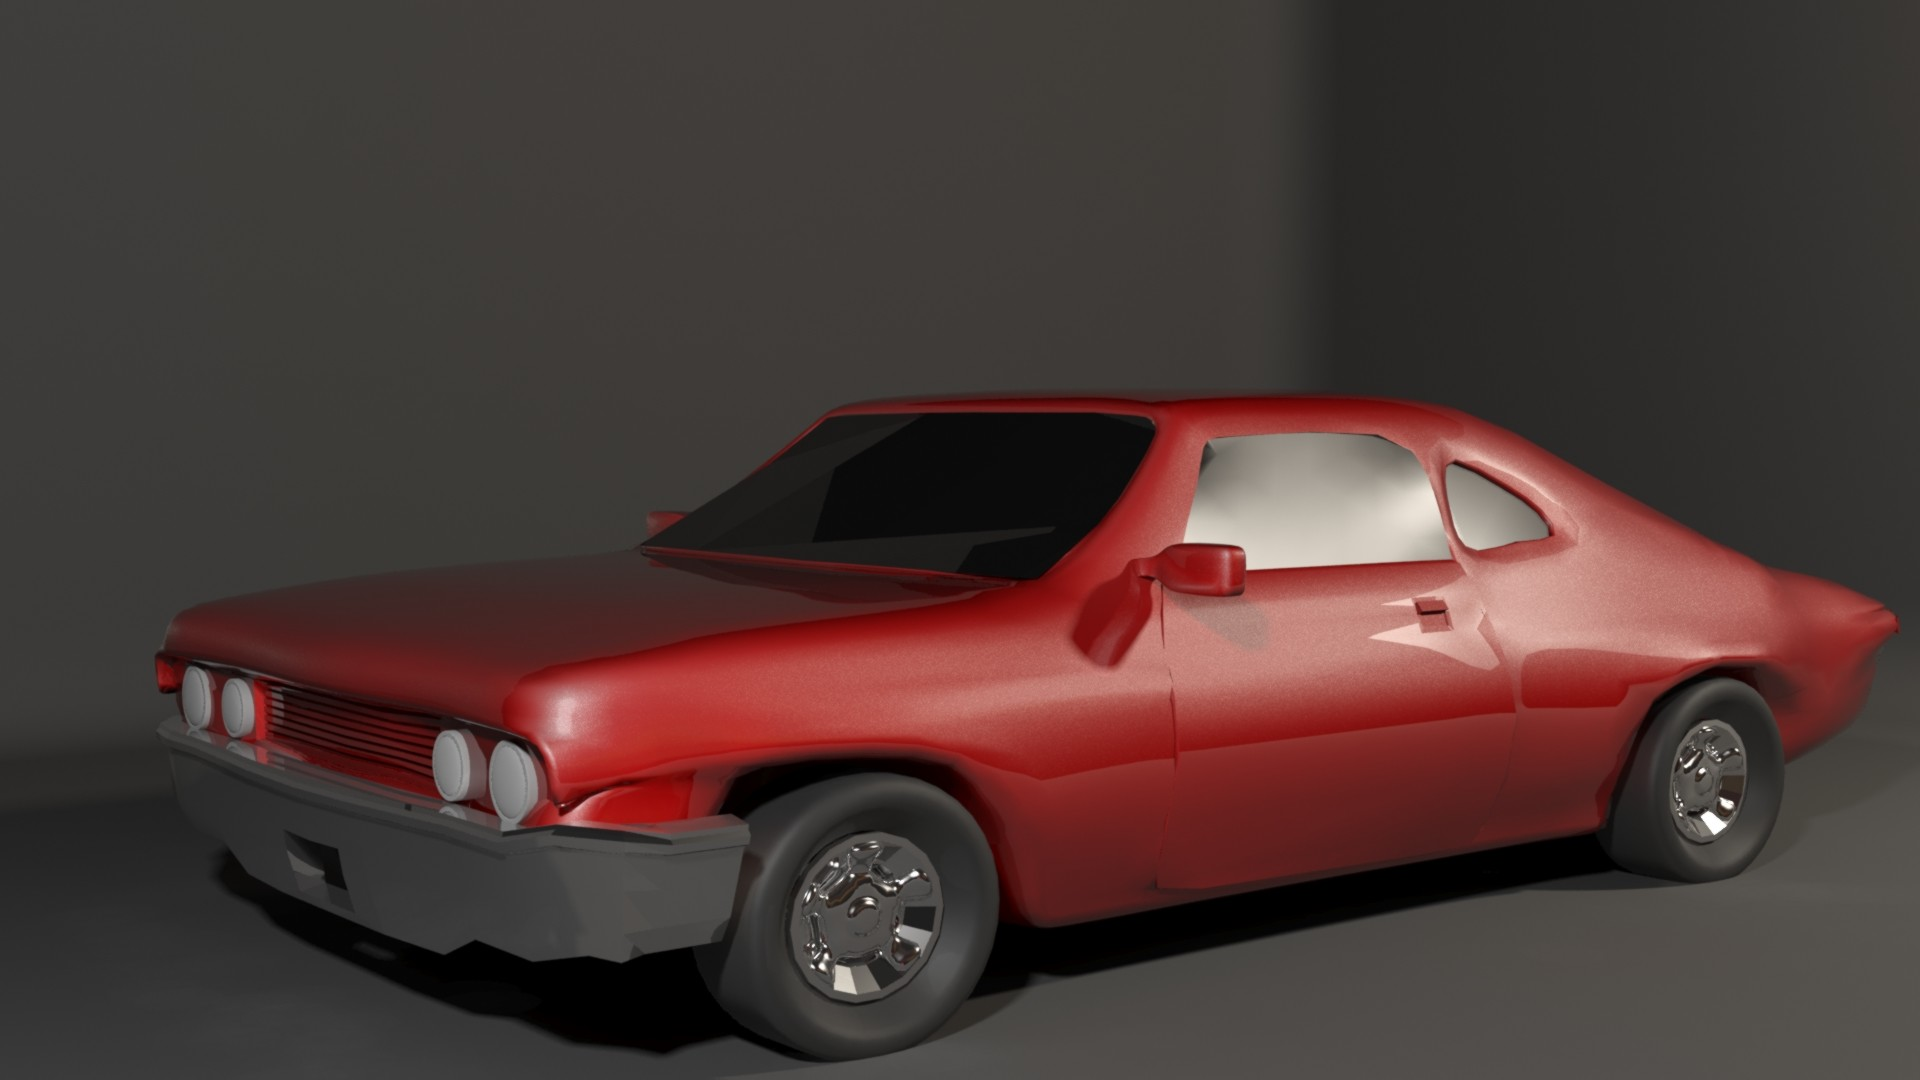 Artstation 3d Model Of A 1965 Chevrolet Impala Ss Sport